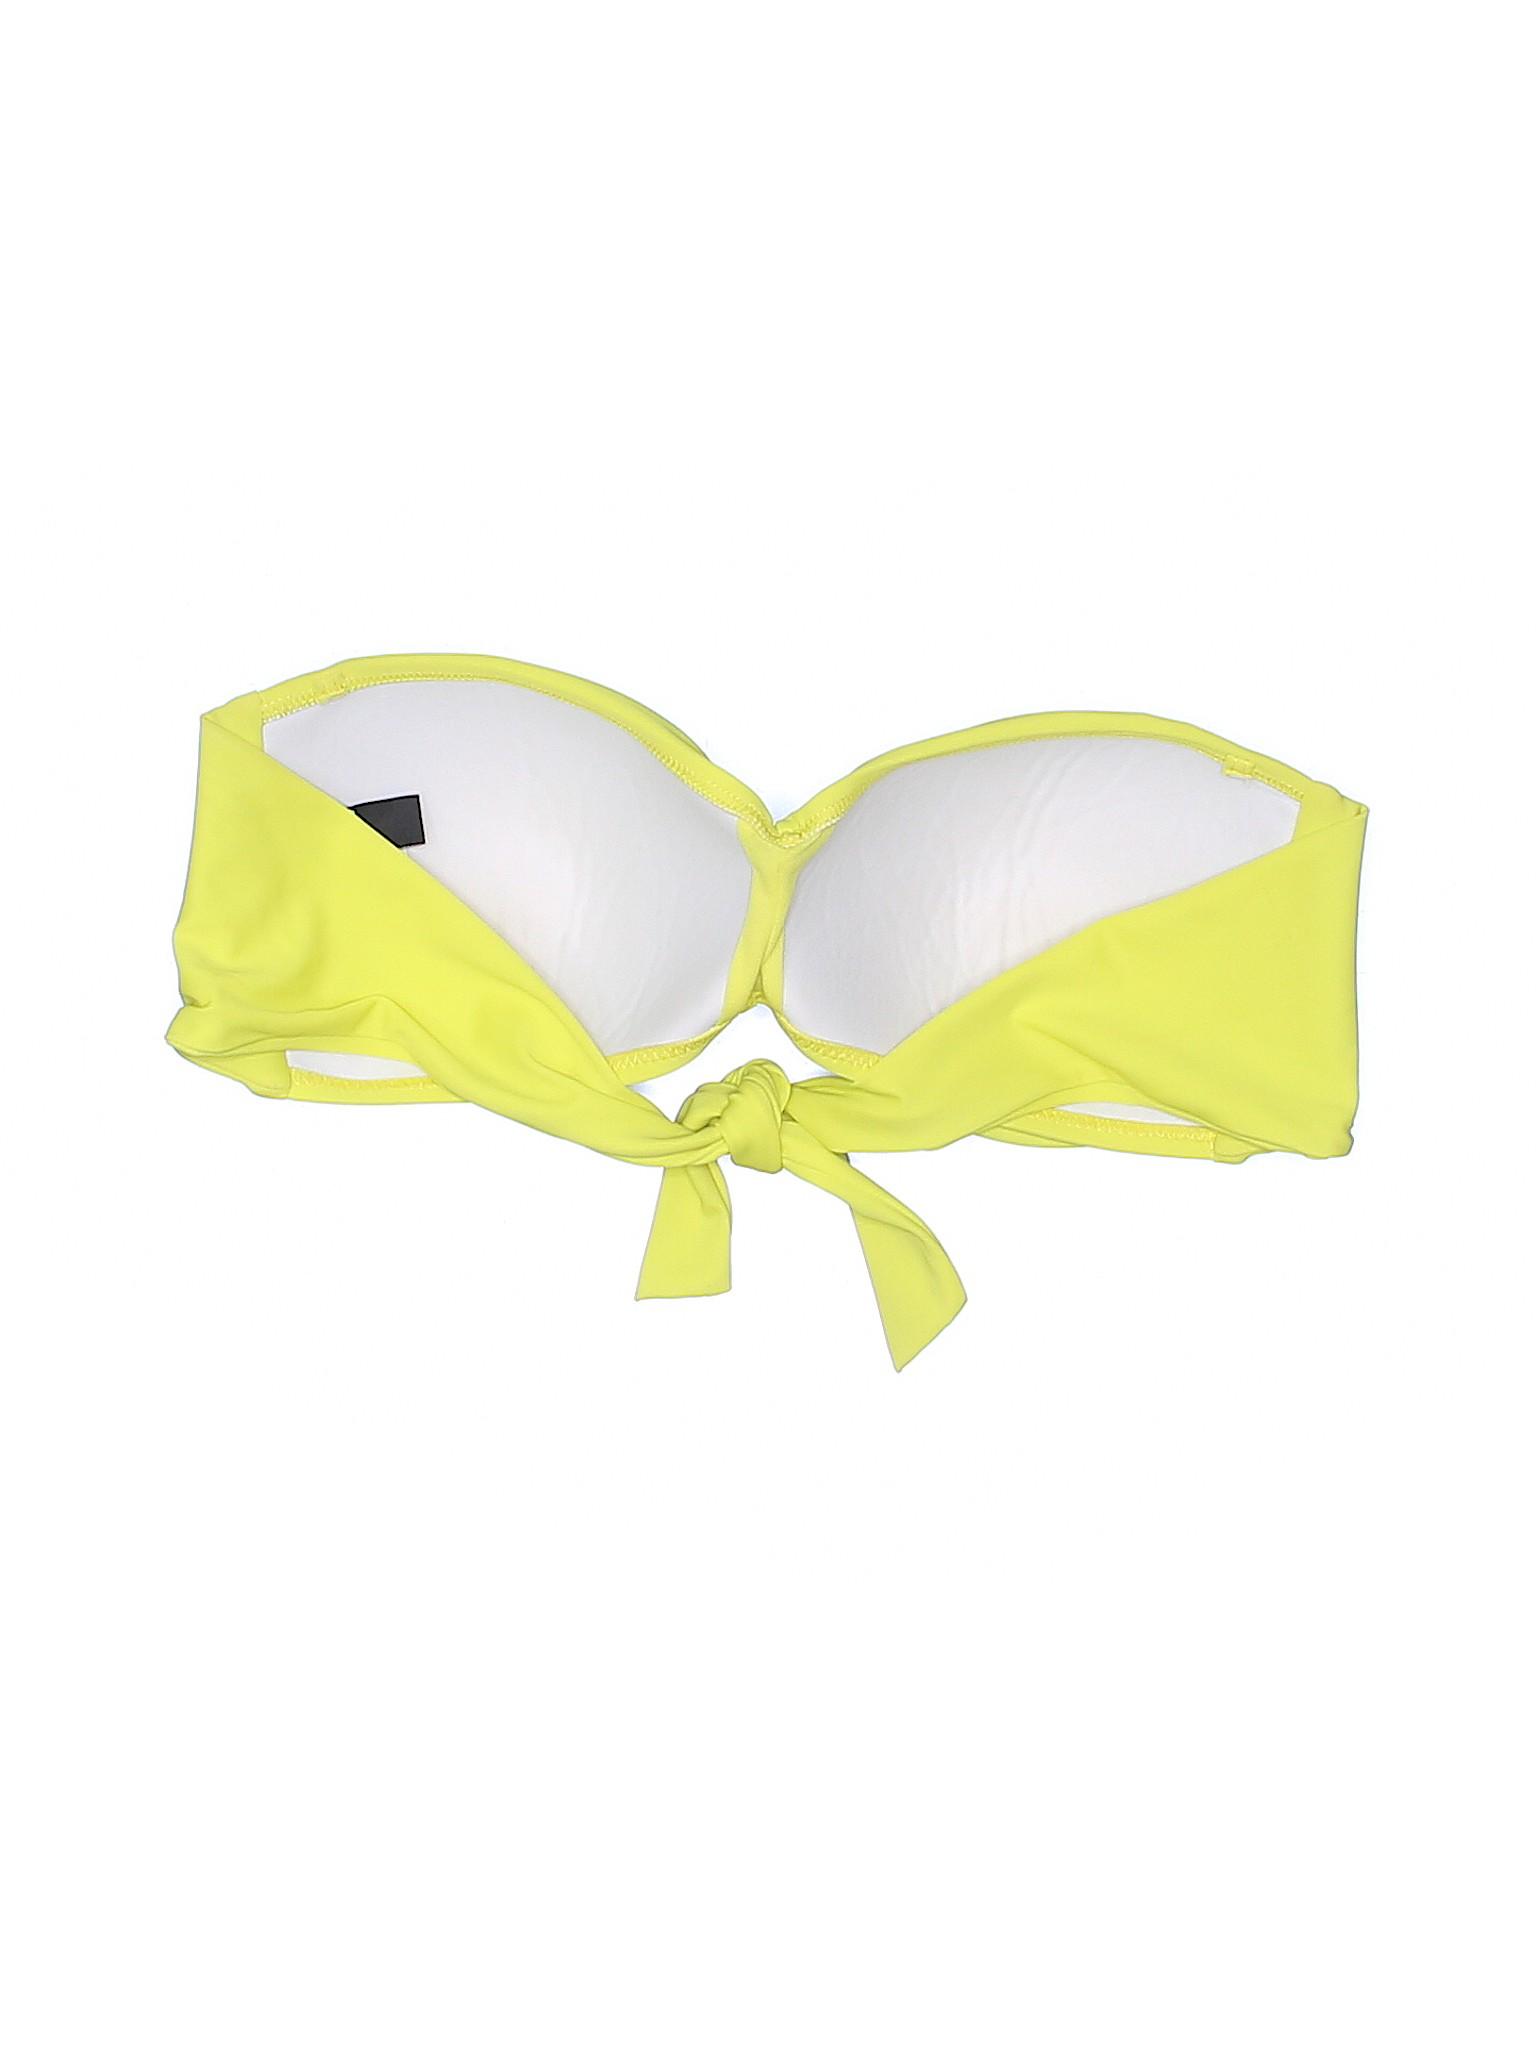 Swimsuit Schwartz Top ABS Allen Boutique pqtgvg